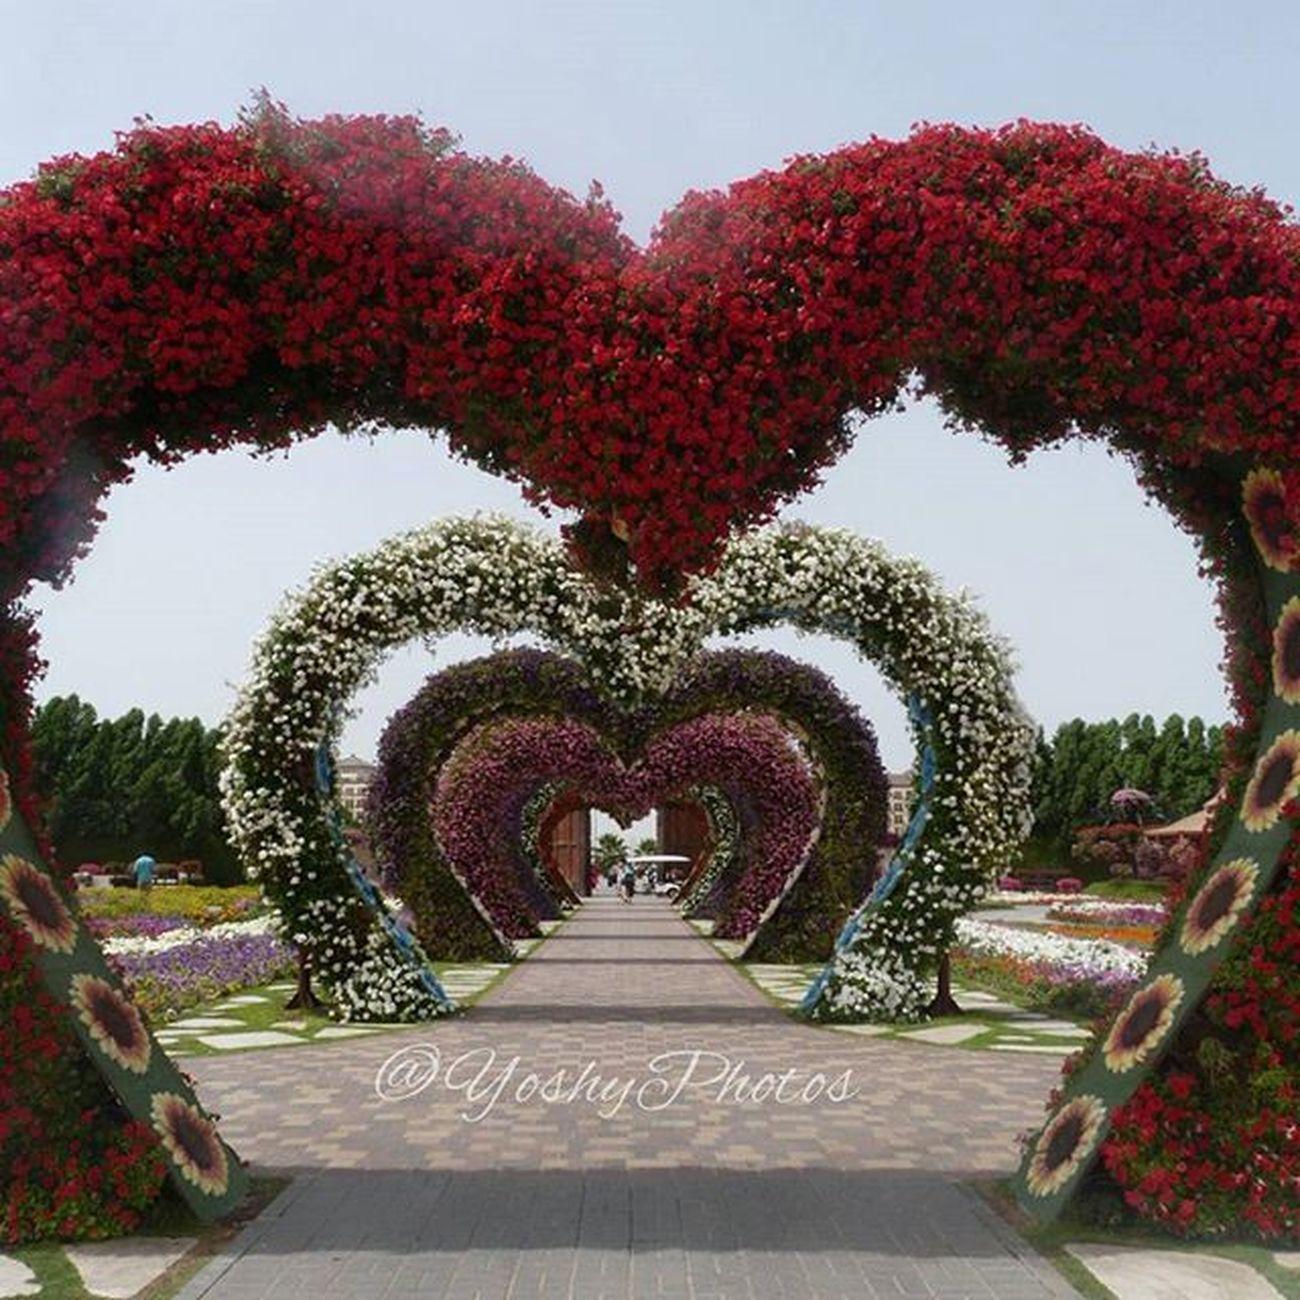 Si mi sueño de amarnos se hiciera realidad... Moncoeurdansunevalise Micorazonenunamaleta Love Flowers MiracleGarden Dubai Hearts Feelings PhotoYoshy March2015 Lumix Mydubai Floreseneldesierto Love Dreams Dreamscometrue